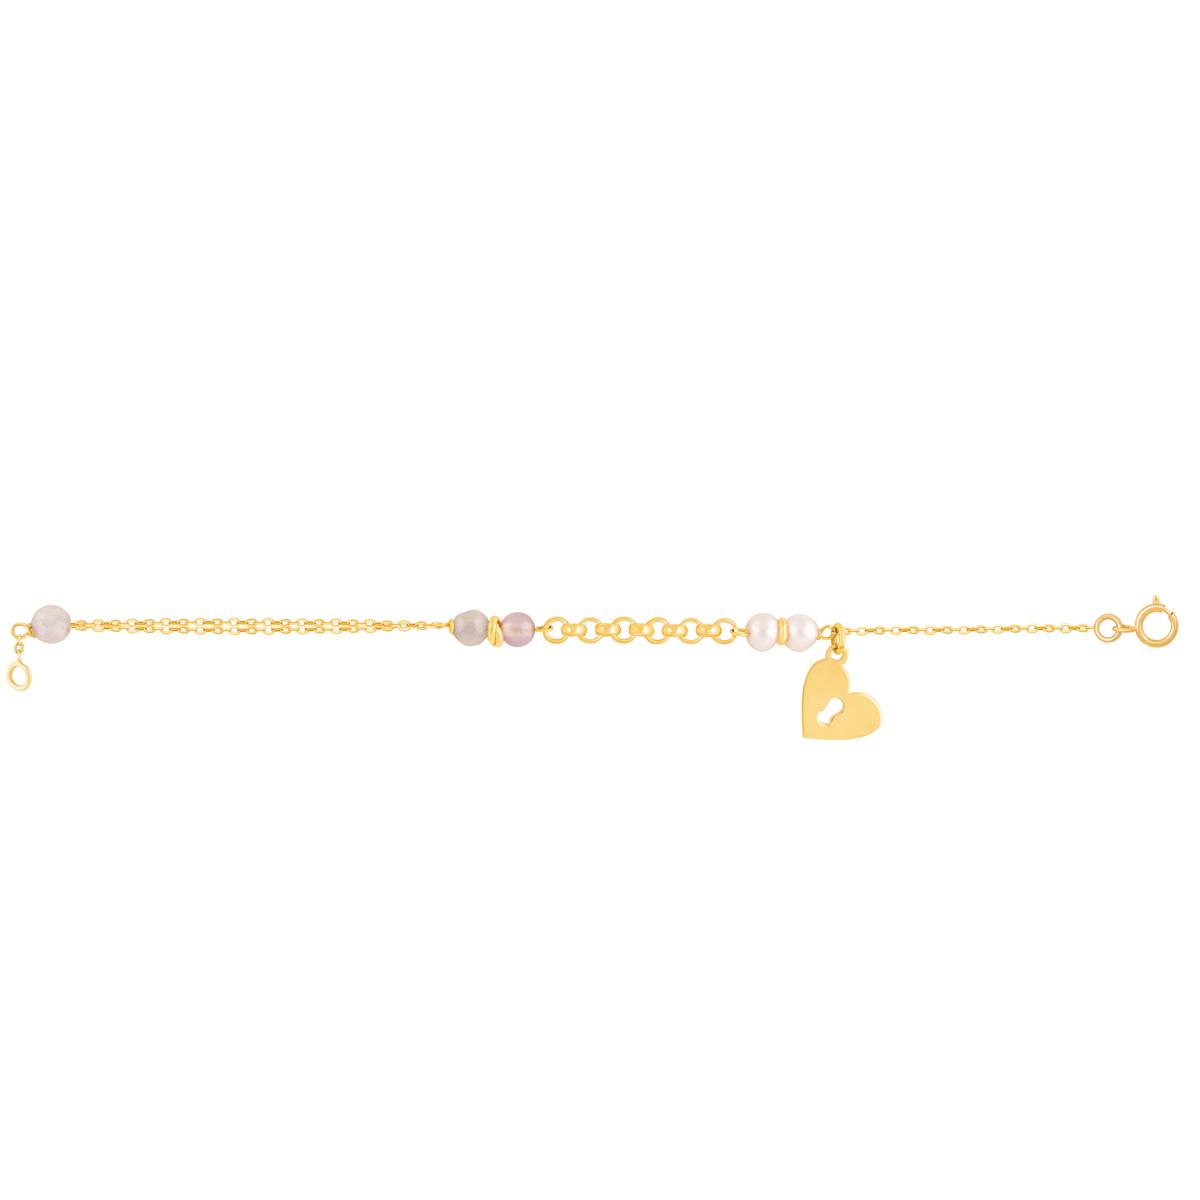 دستبند طلا آویز قفل قلب